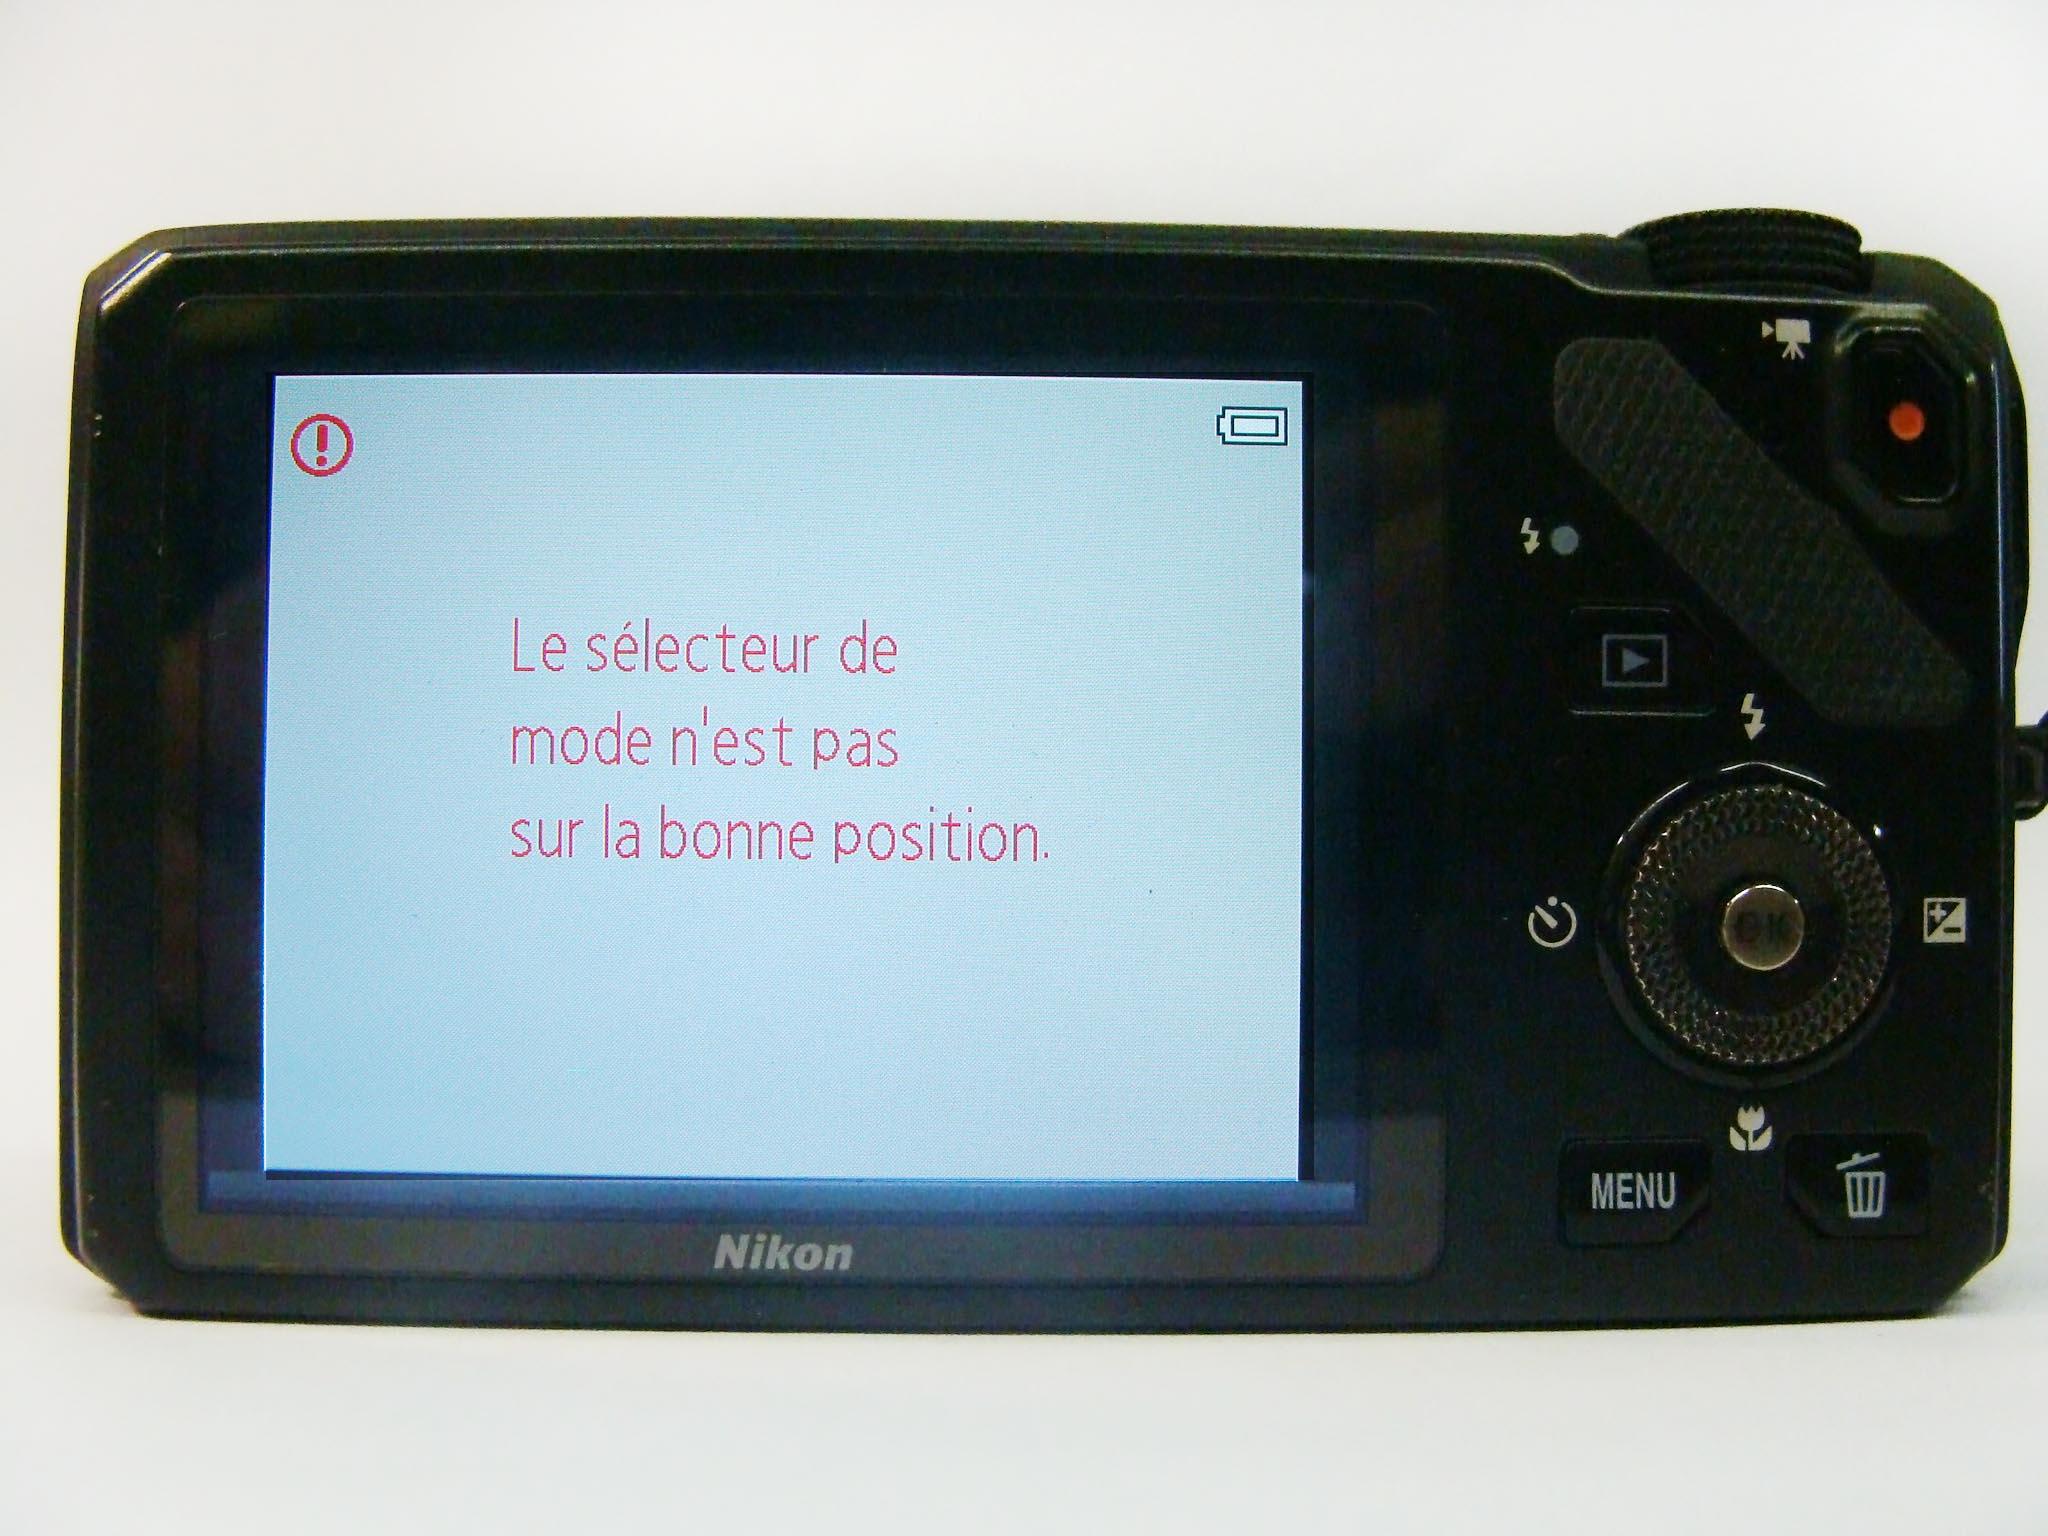 nikon-s9200.jpg